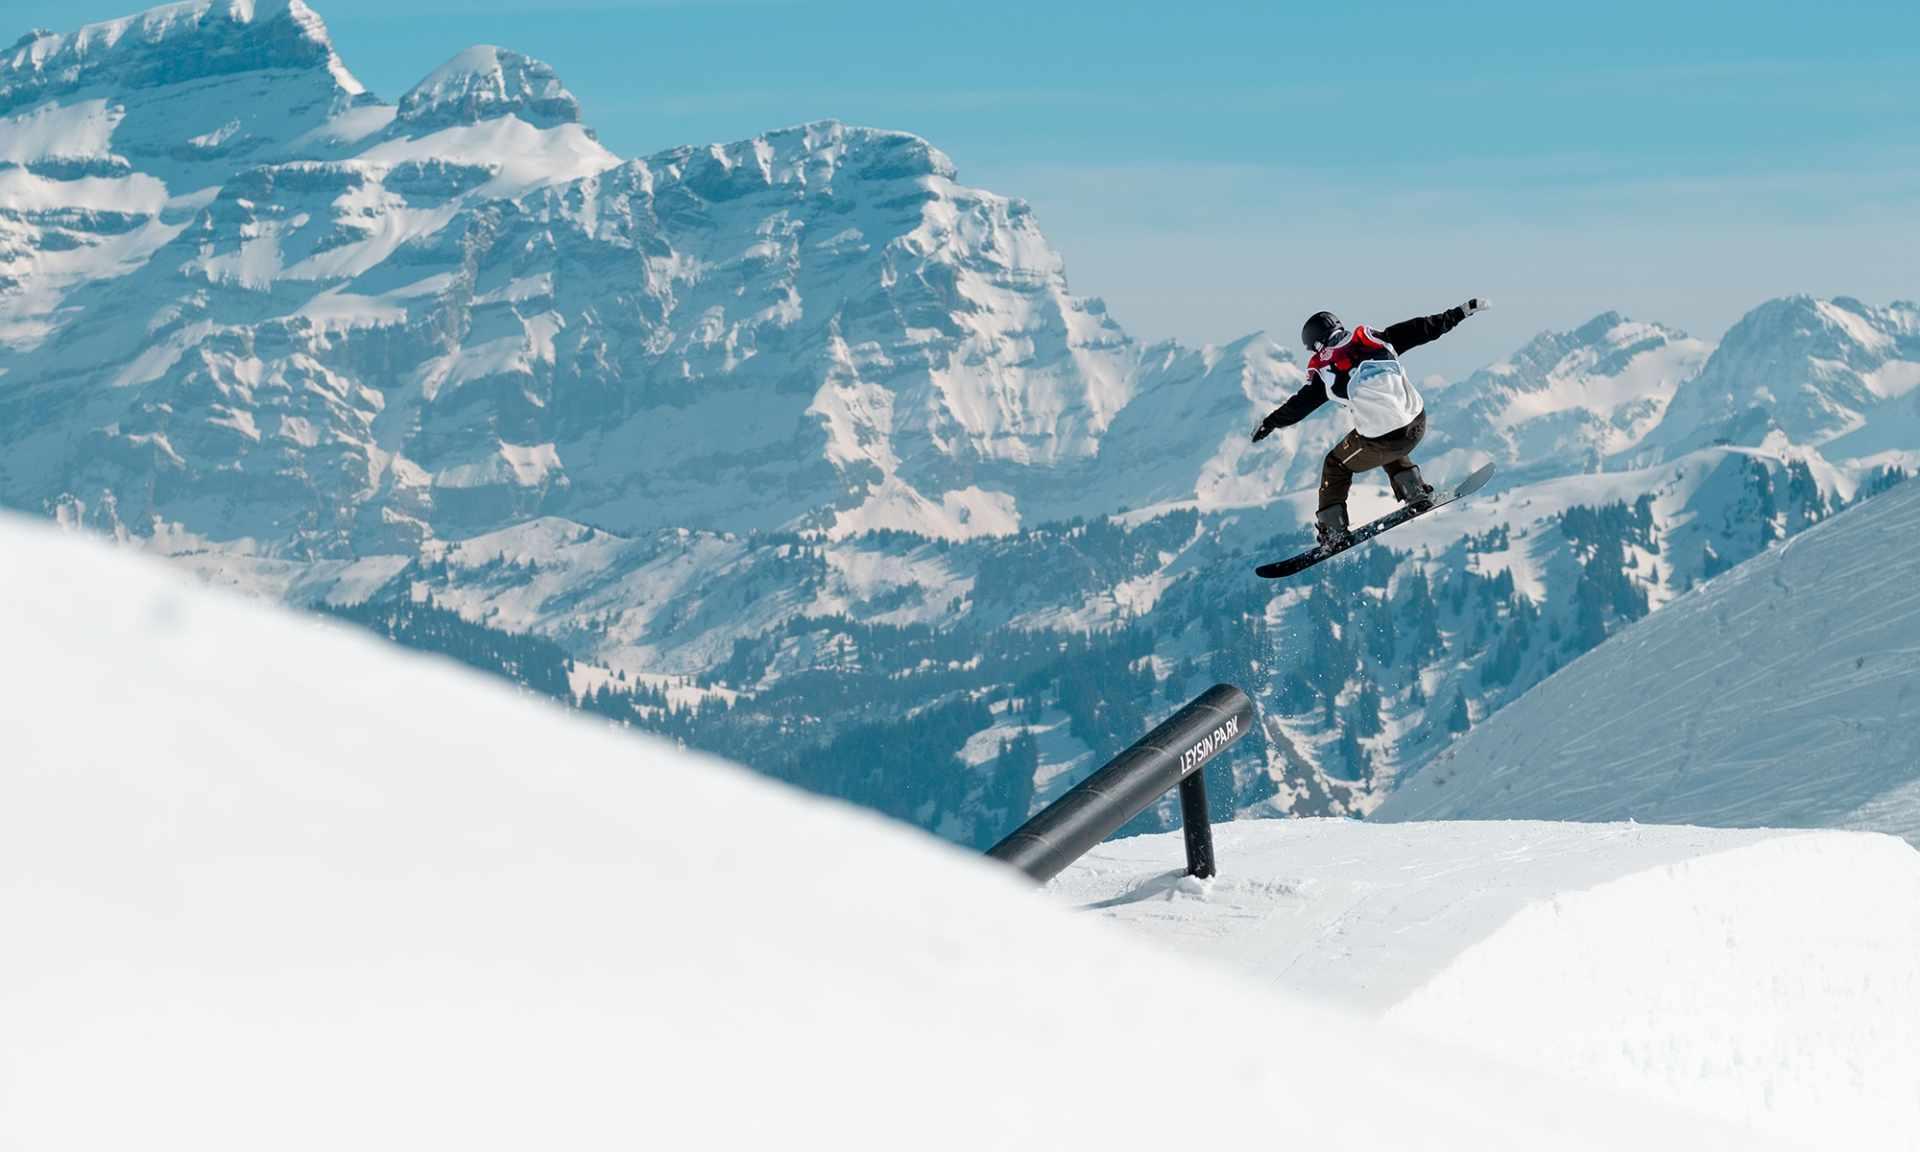 Snowpark with Snowboarder rail jump - Leysin - Hiver